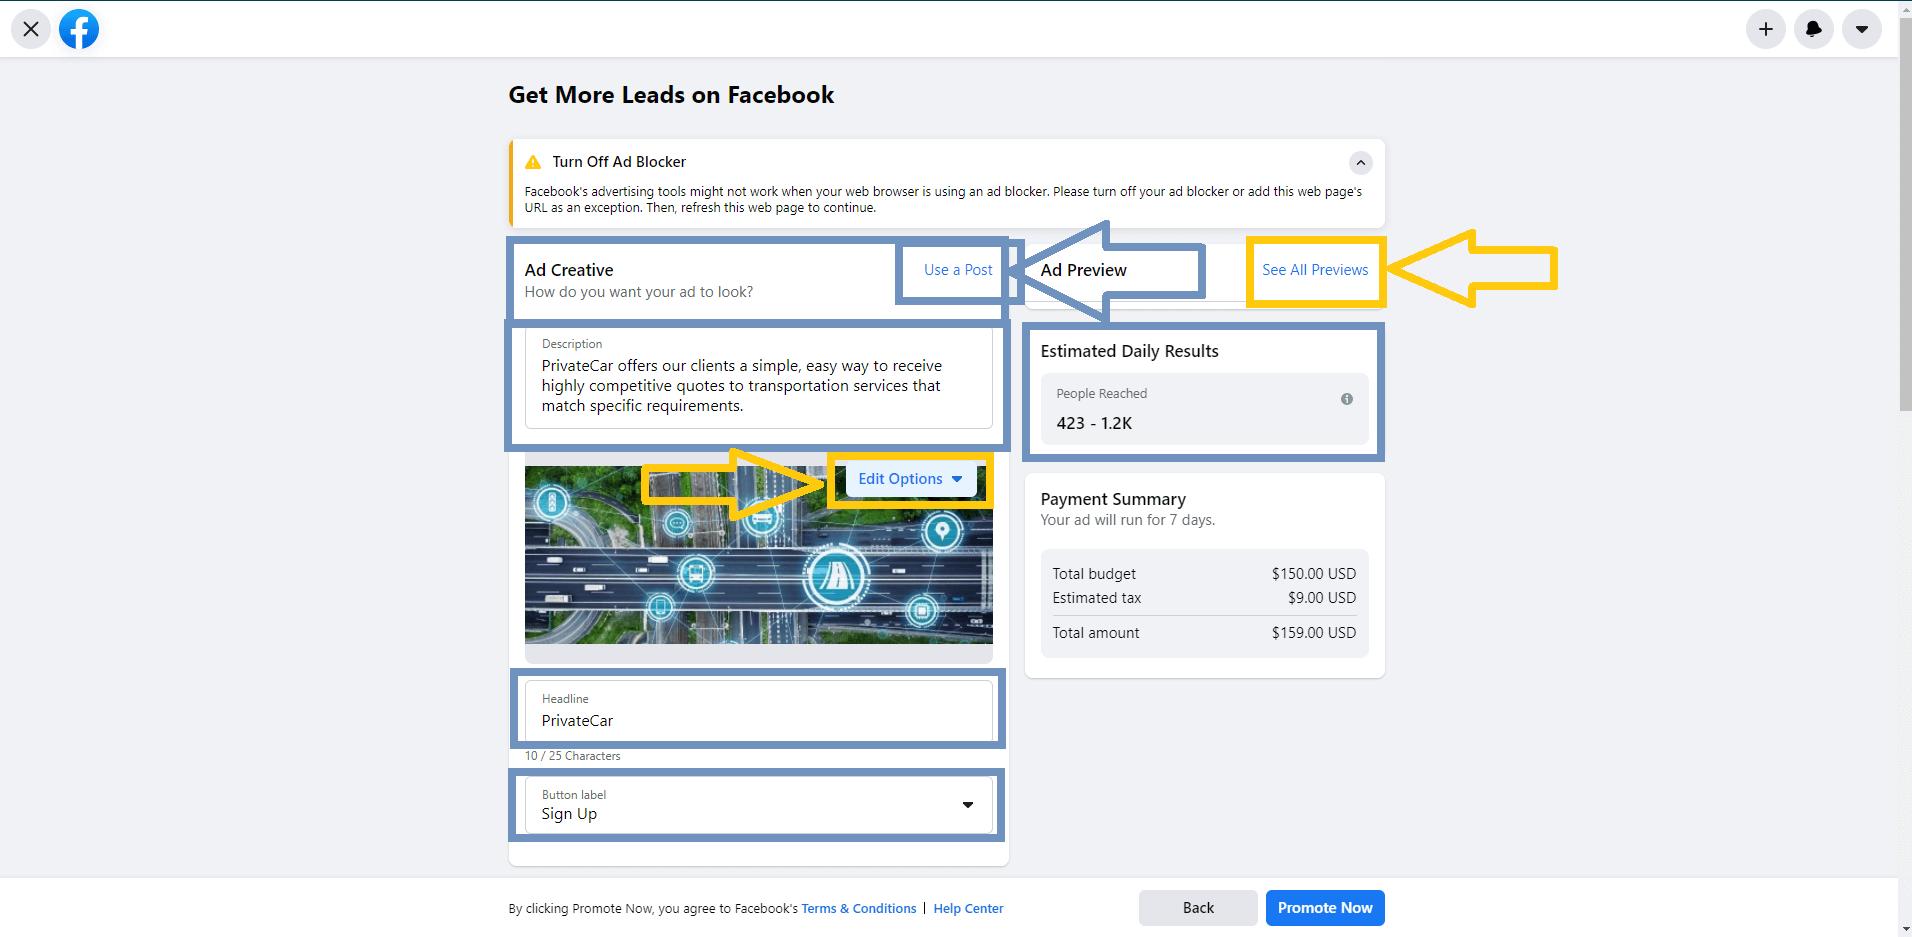 Facebook Usage